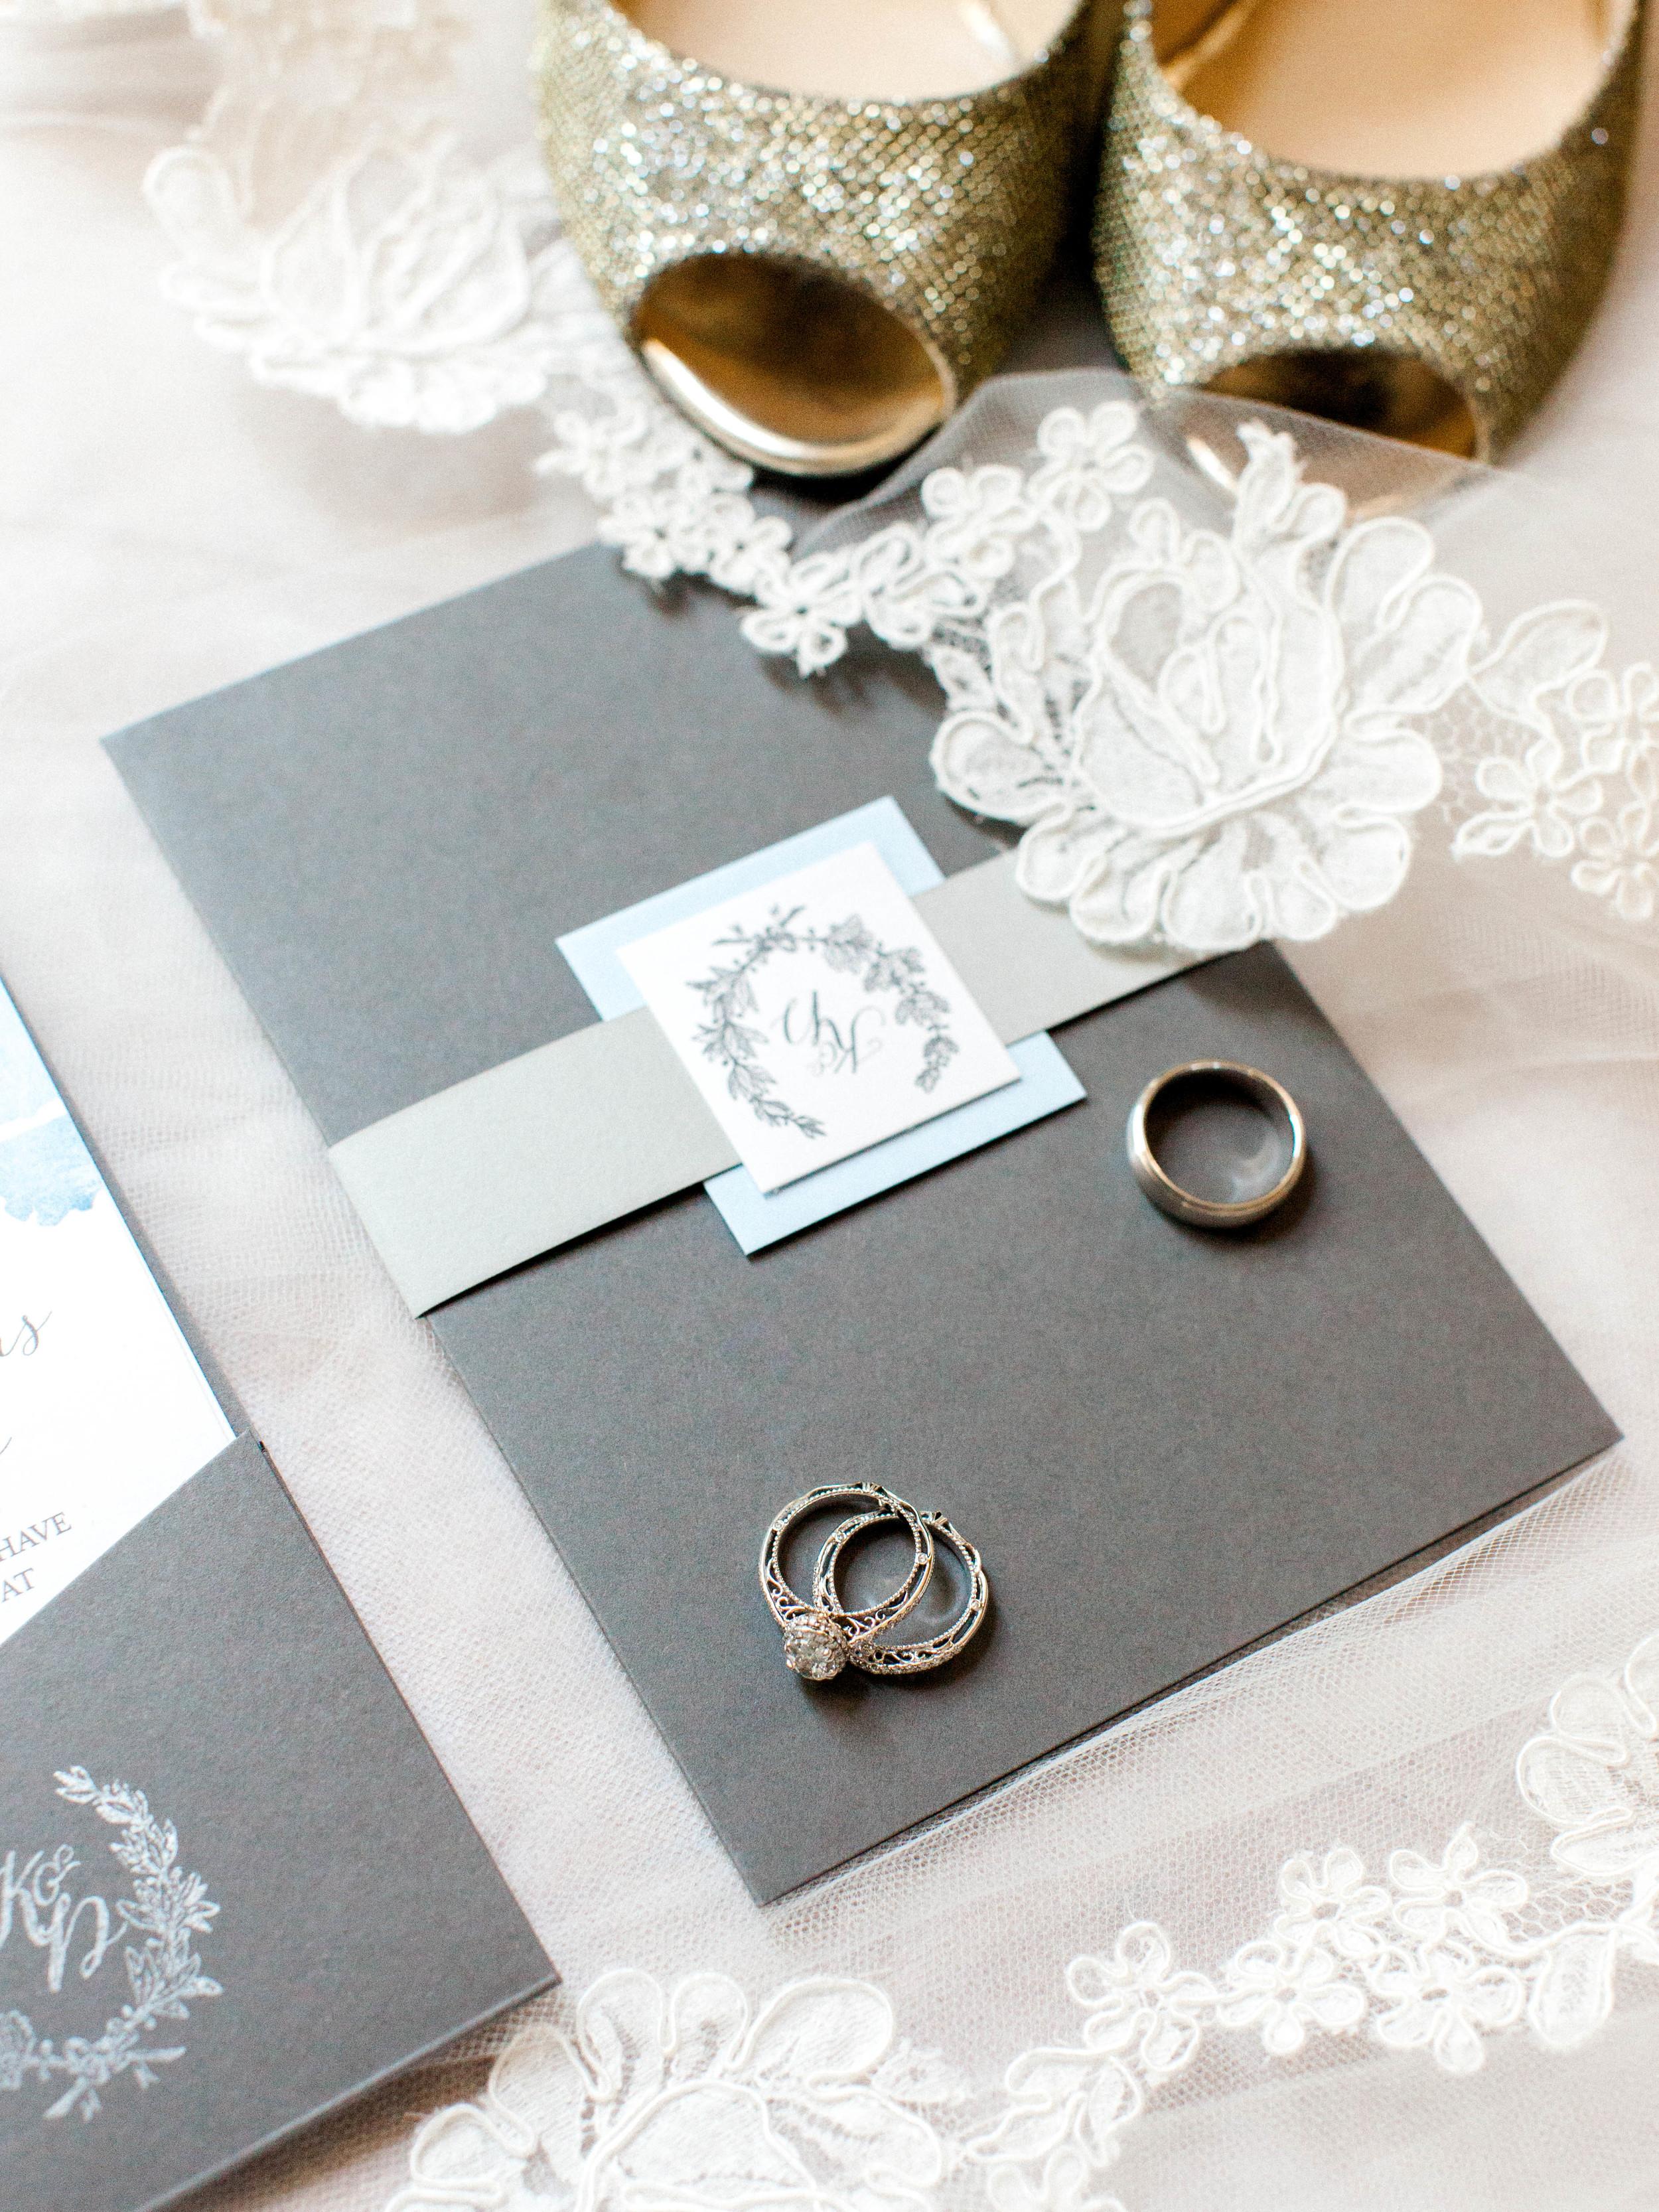 st.louis_.wedding.photographer-46.jpg